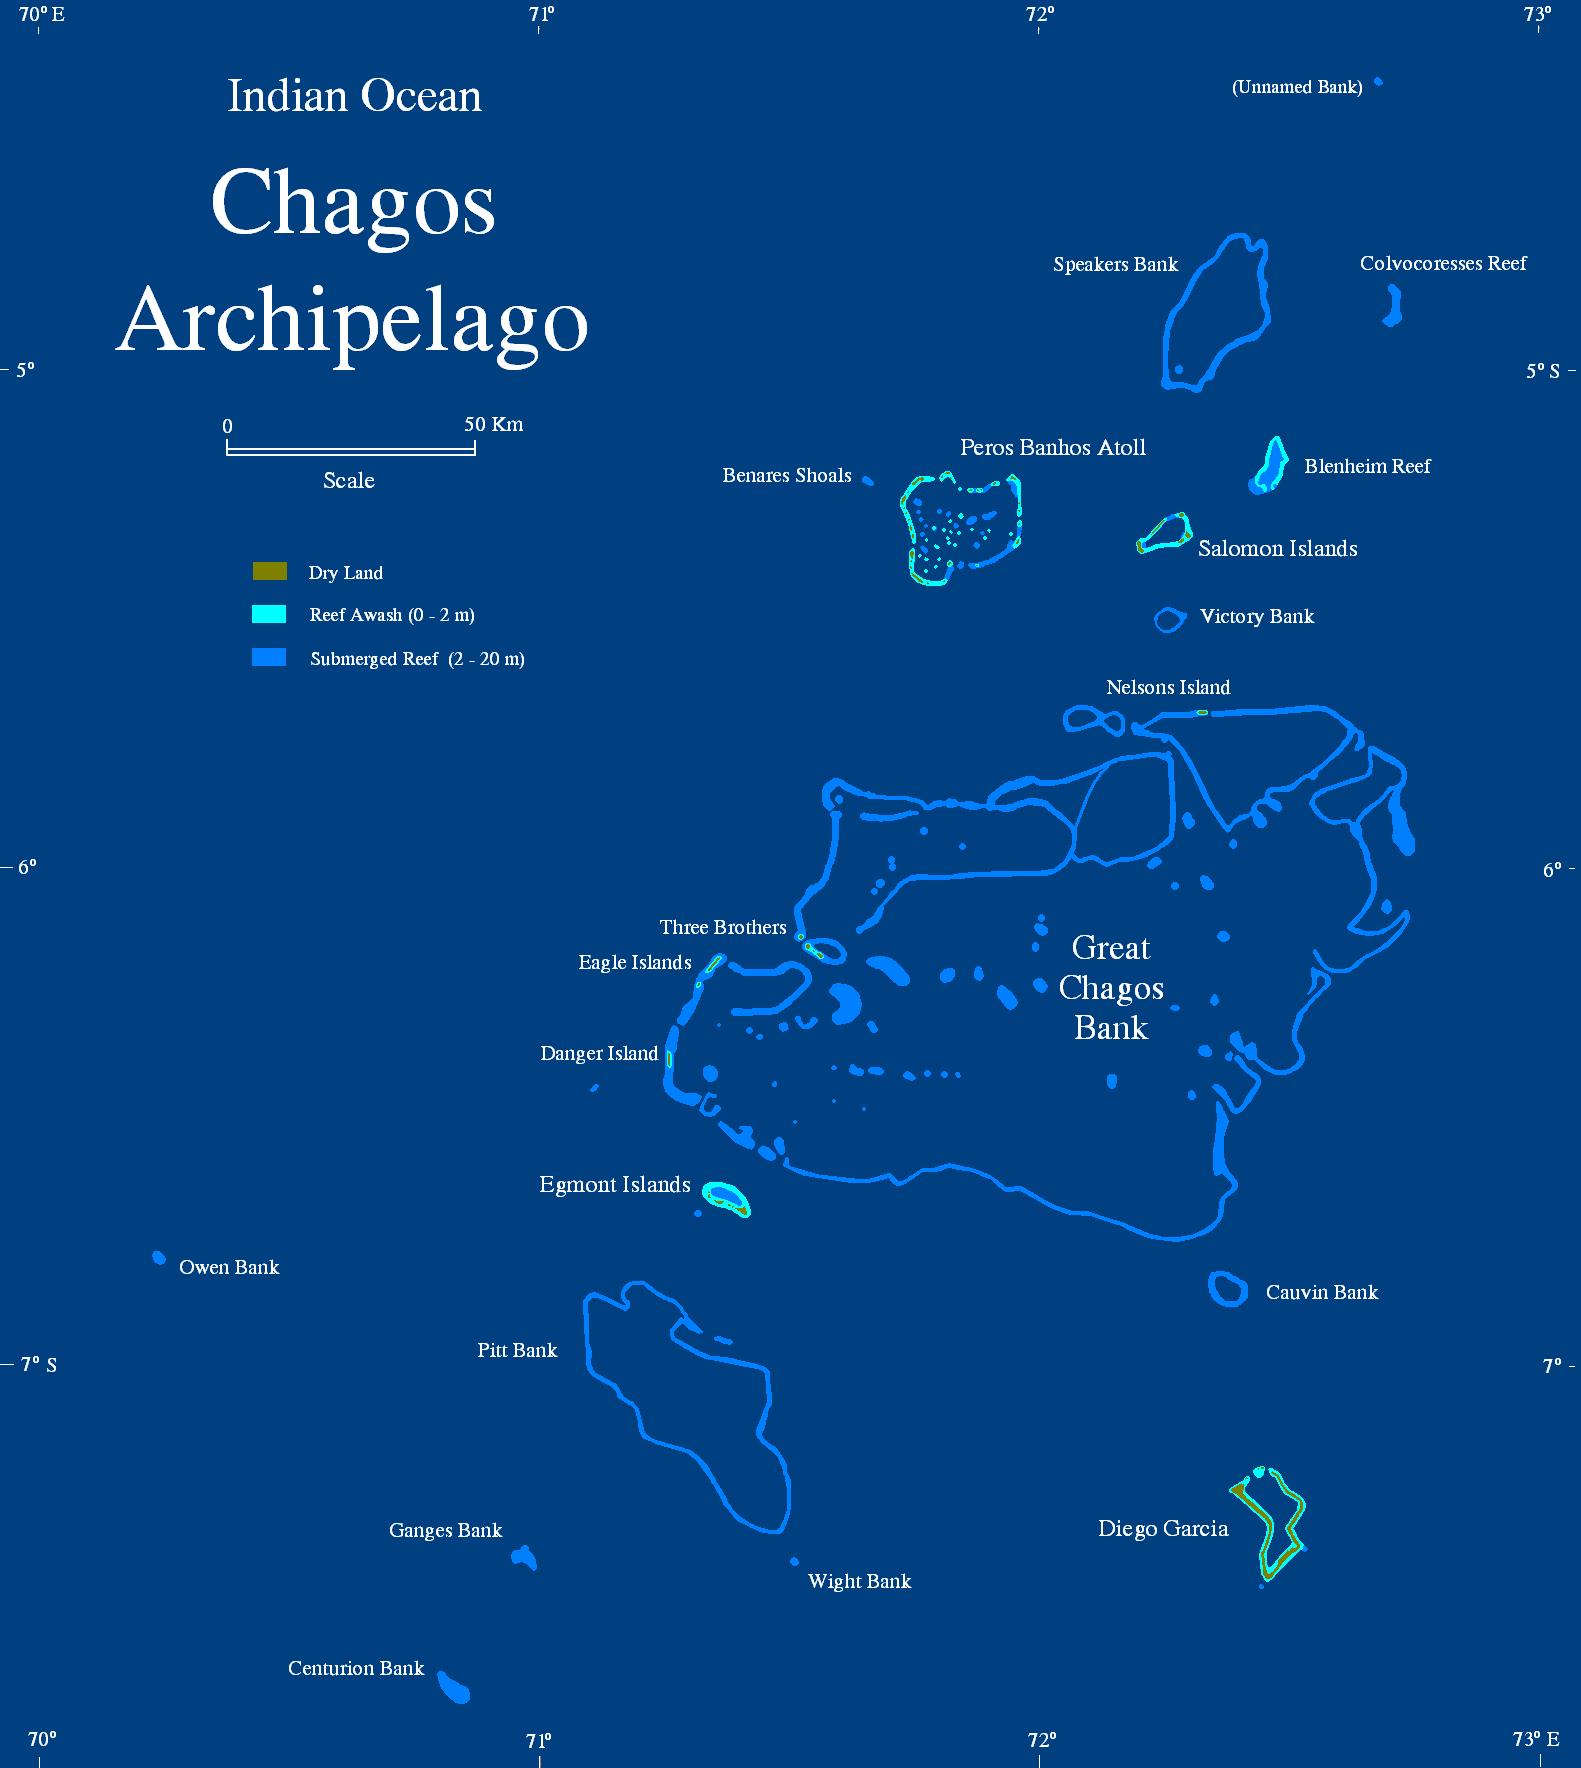 Chagos Archipelago Wikipedia